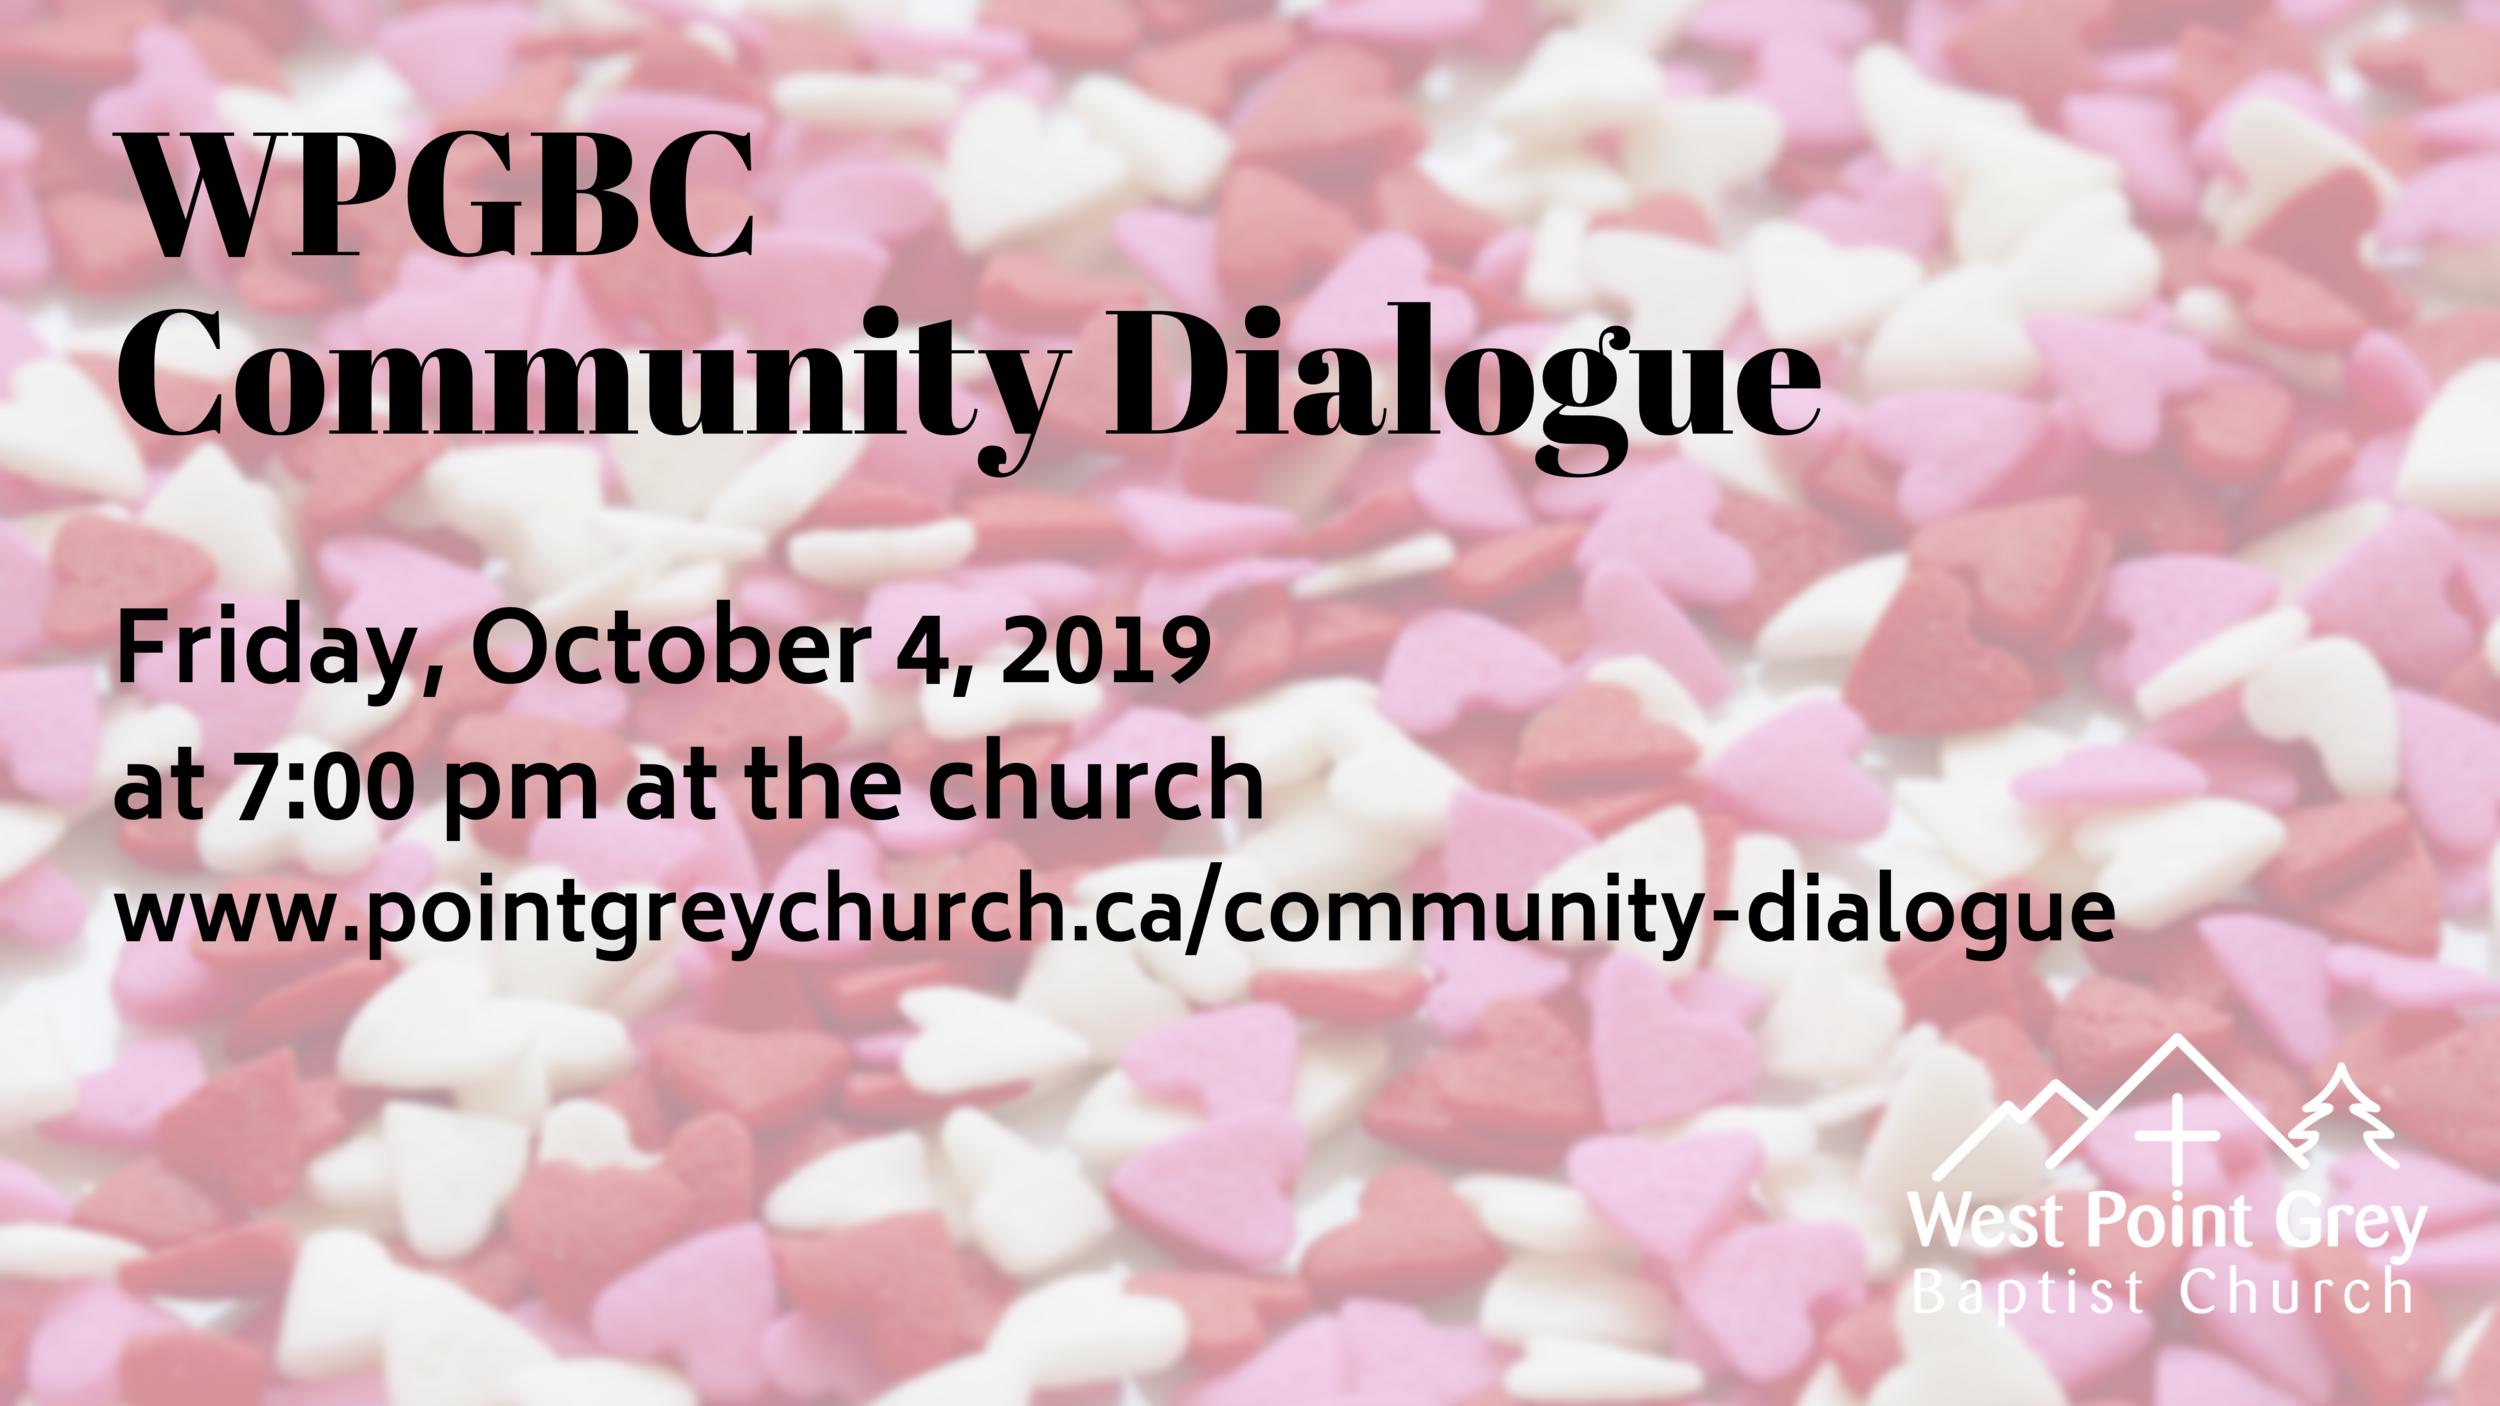 Community Dialogue - WPGBC